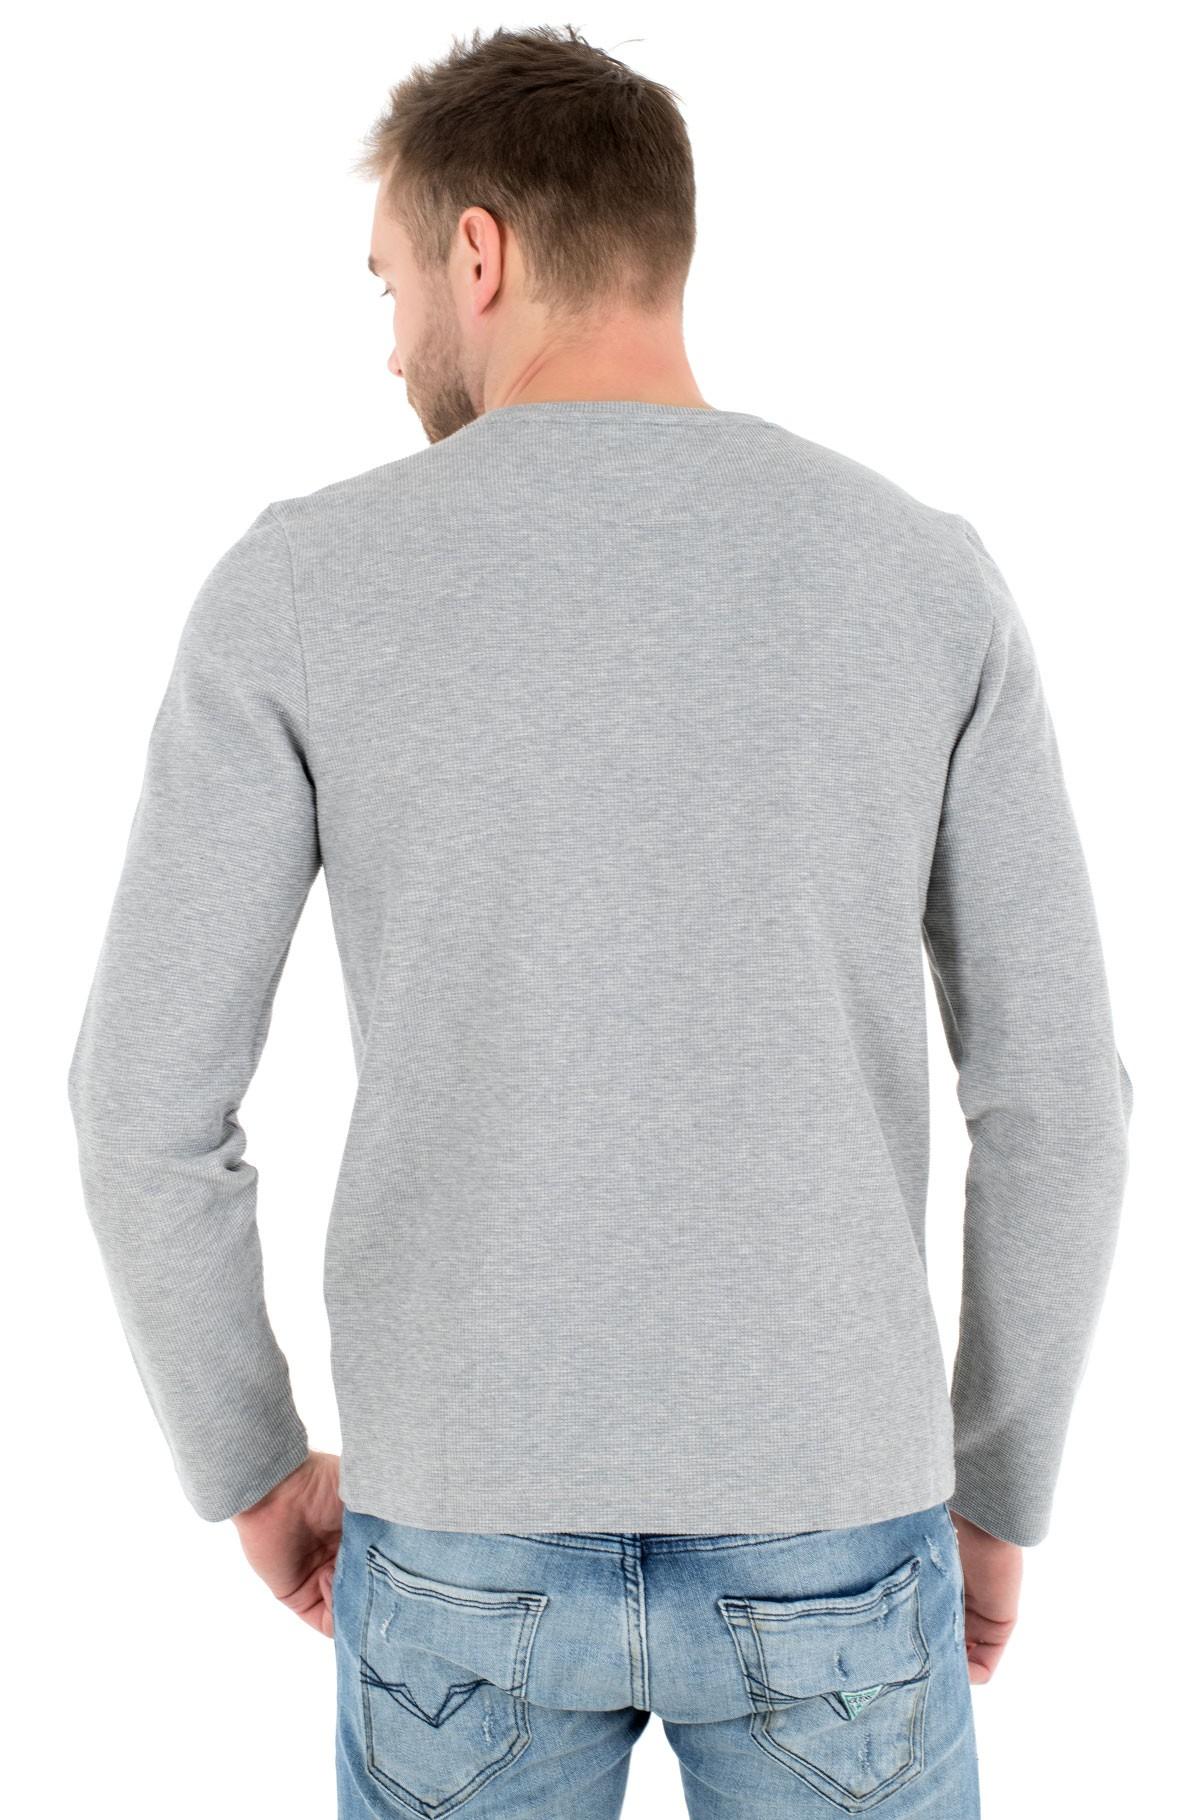 T-krekls ar garām piedurknēm  WAFFLE LONG SLEEVE TEE-full-2